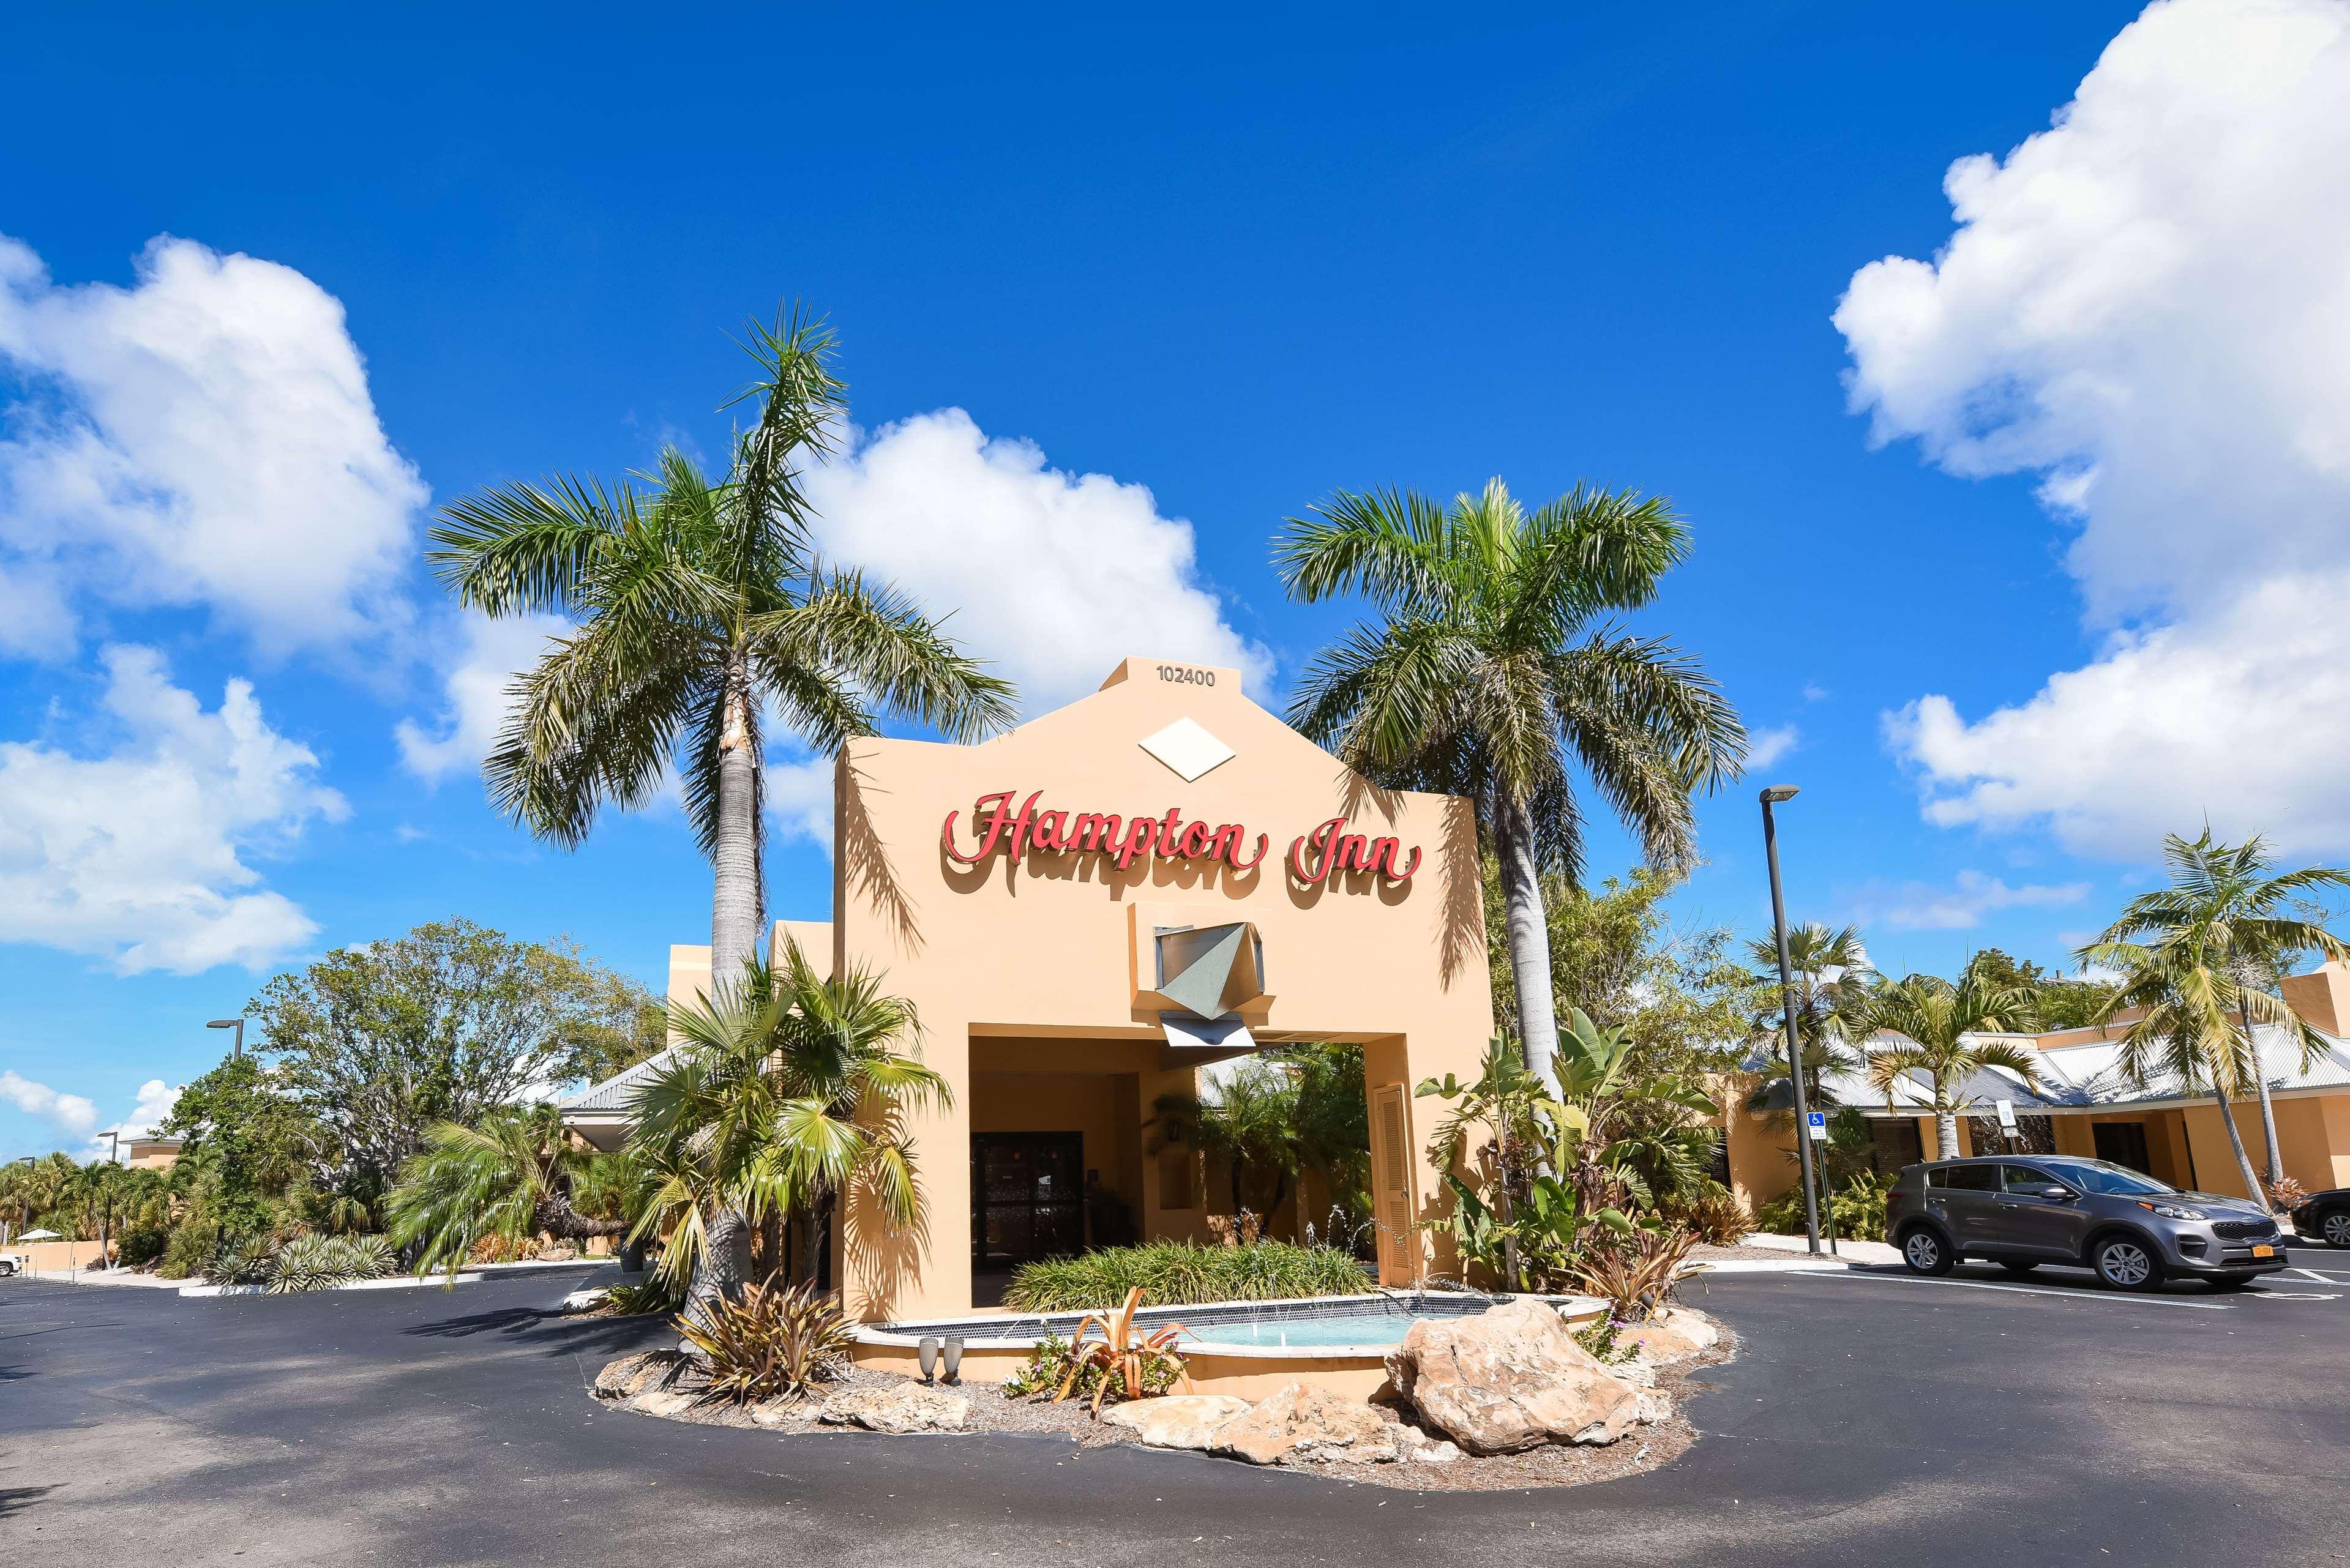 Hampton Inn Key Largo, FL image 2